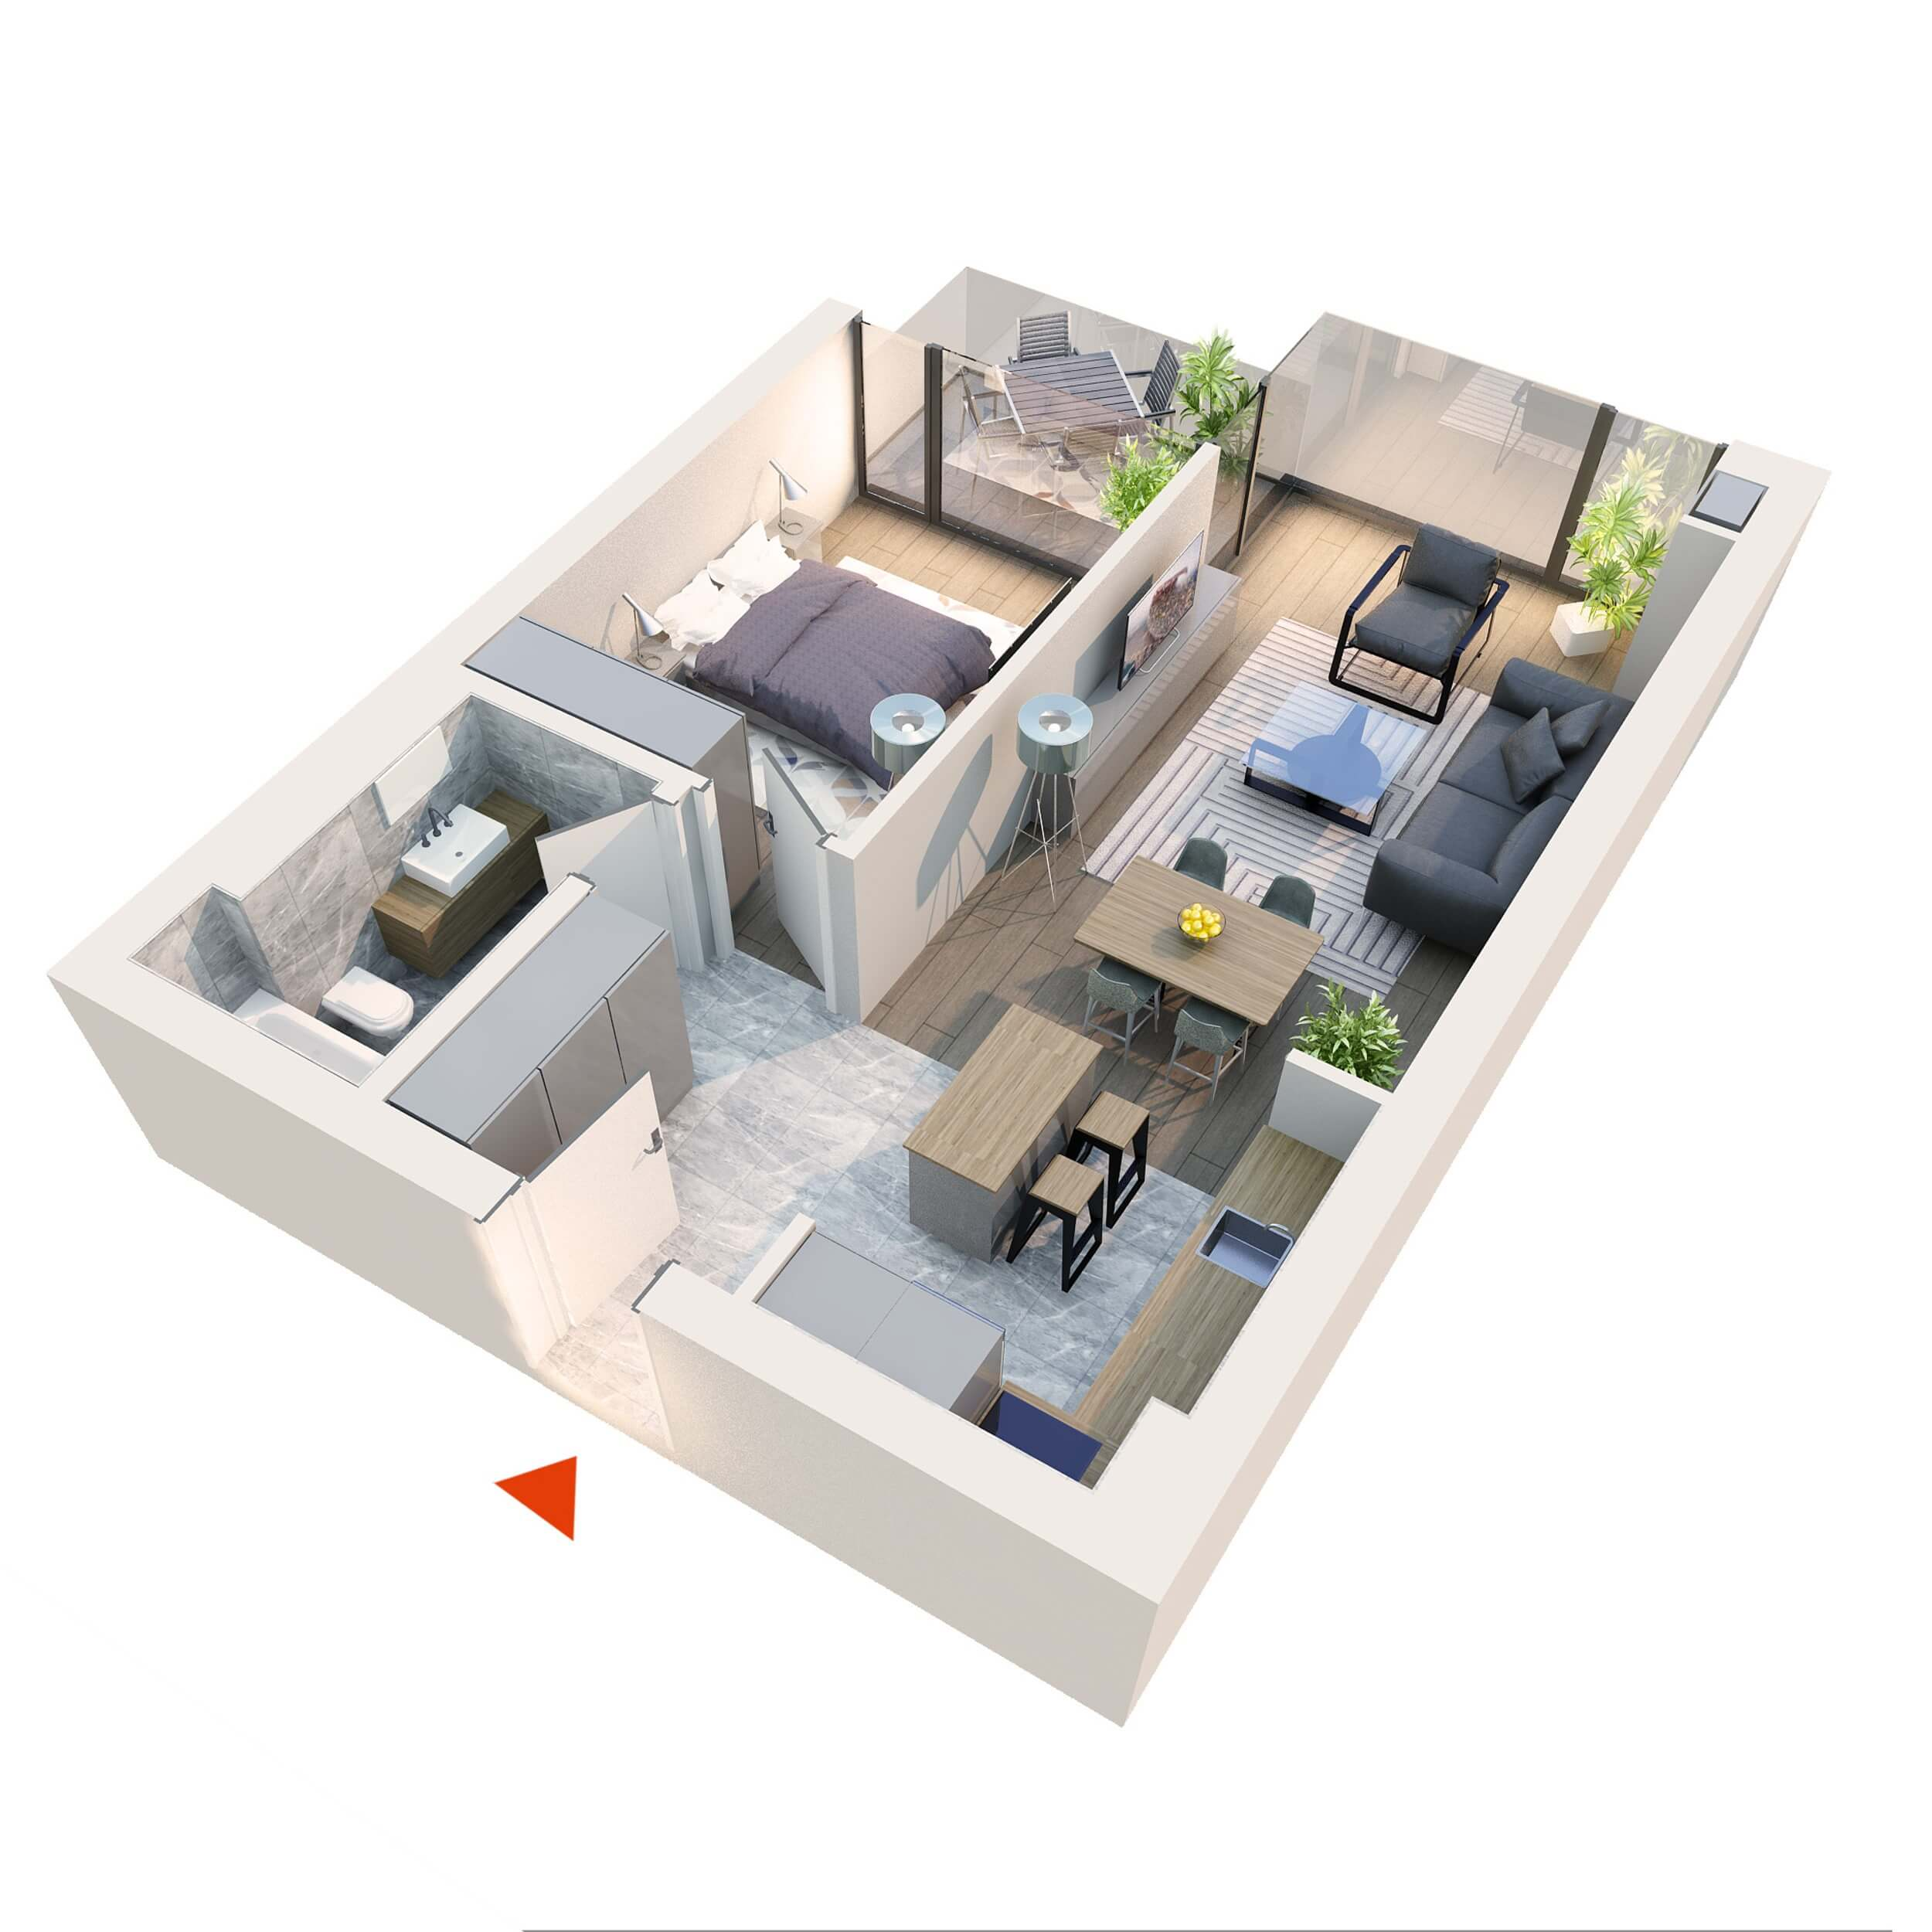 Apartament 2 camere tip 2D1 B12 Logie | Etaj 1-5 | Corp C8 | Faza 2